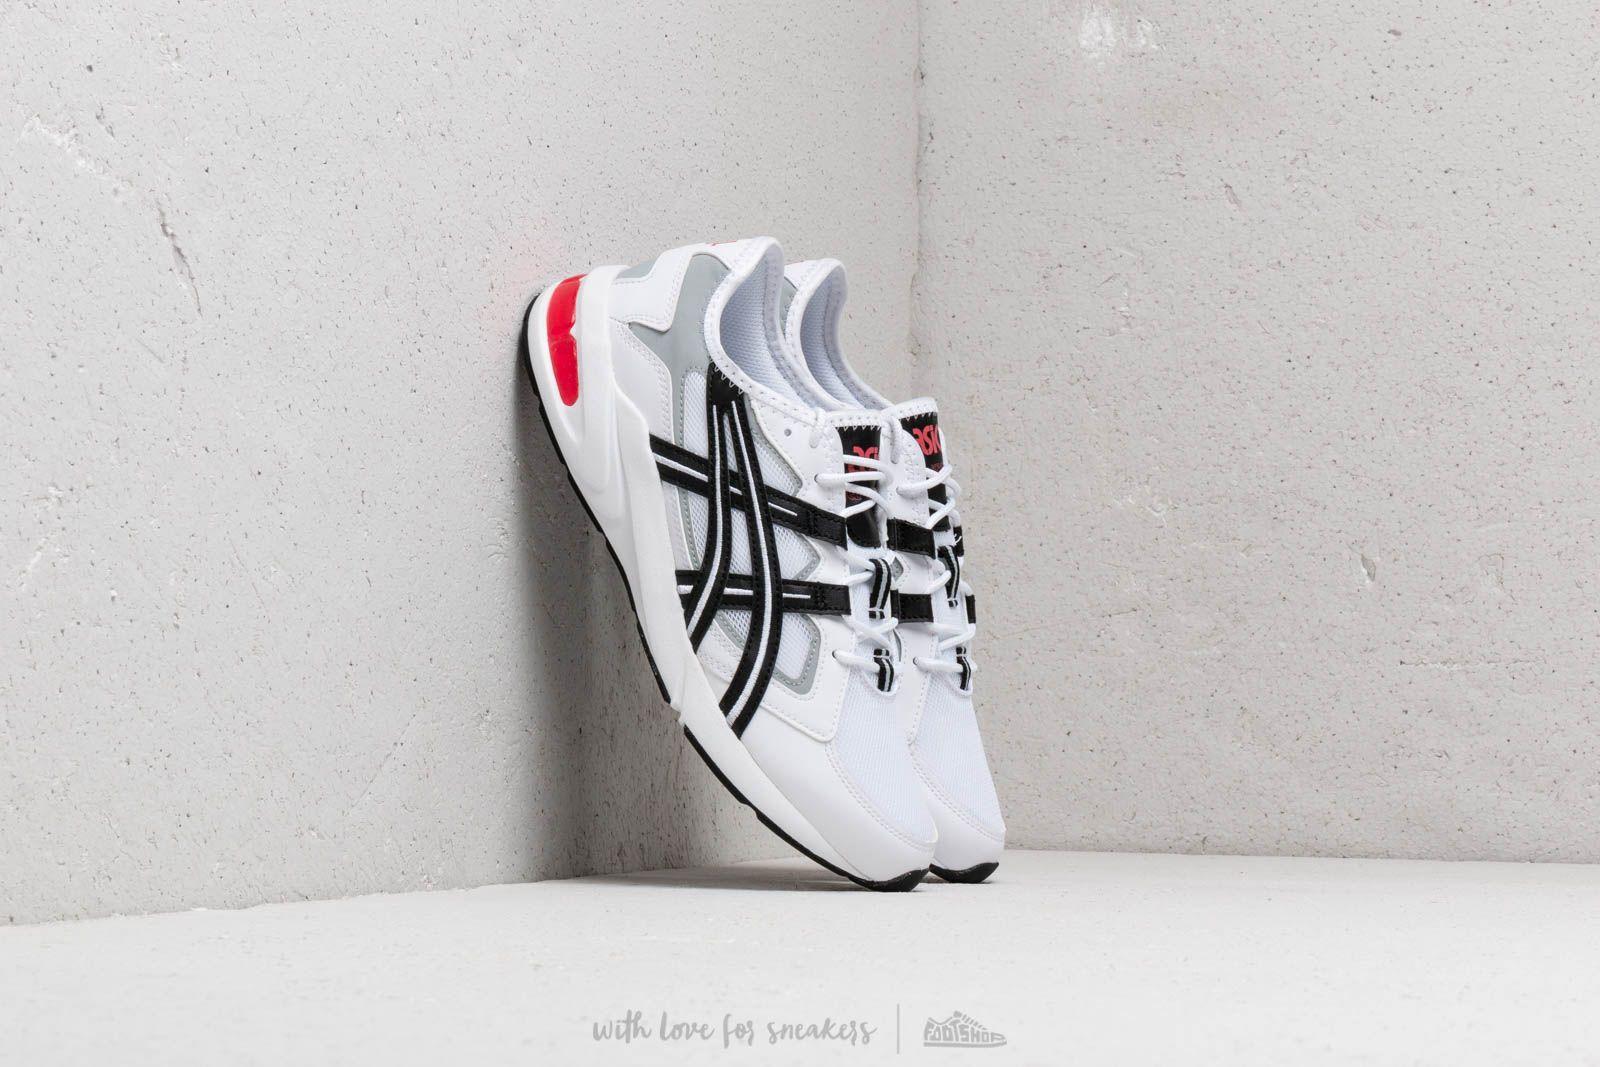 Herren Sneaker und Schuhe Asics Gel-Kayano 5.1 White/ Black